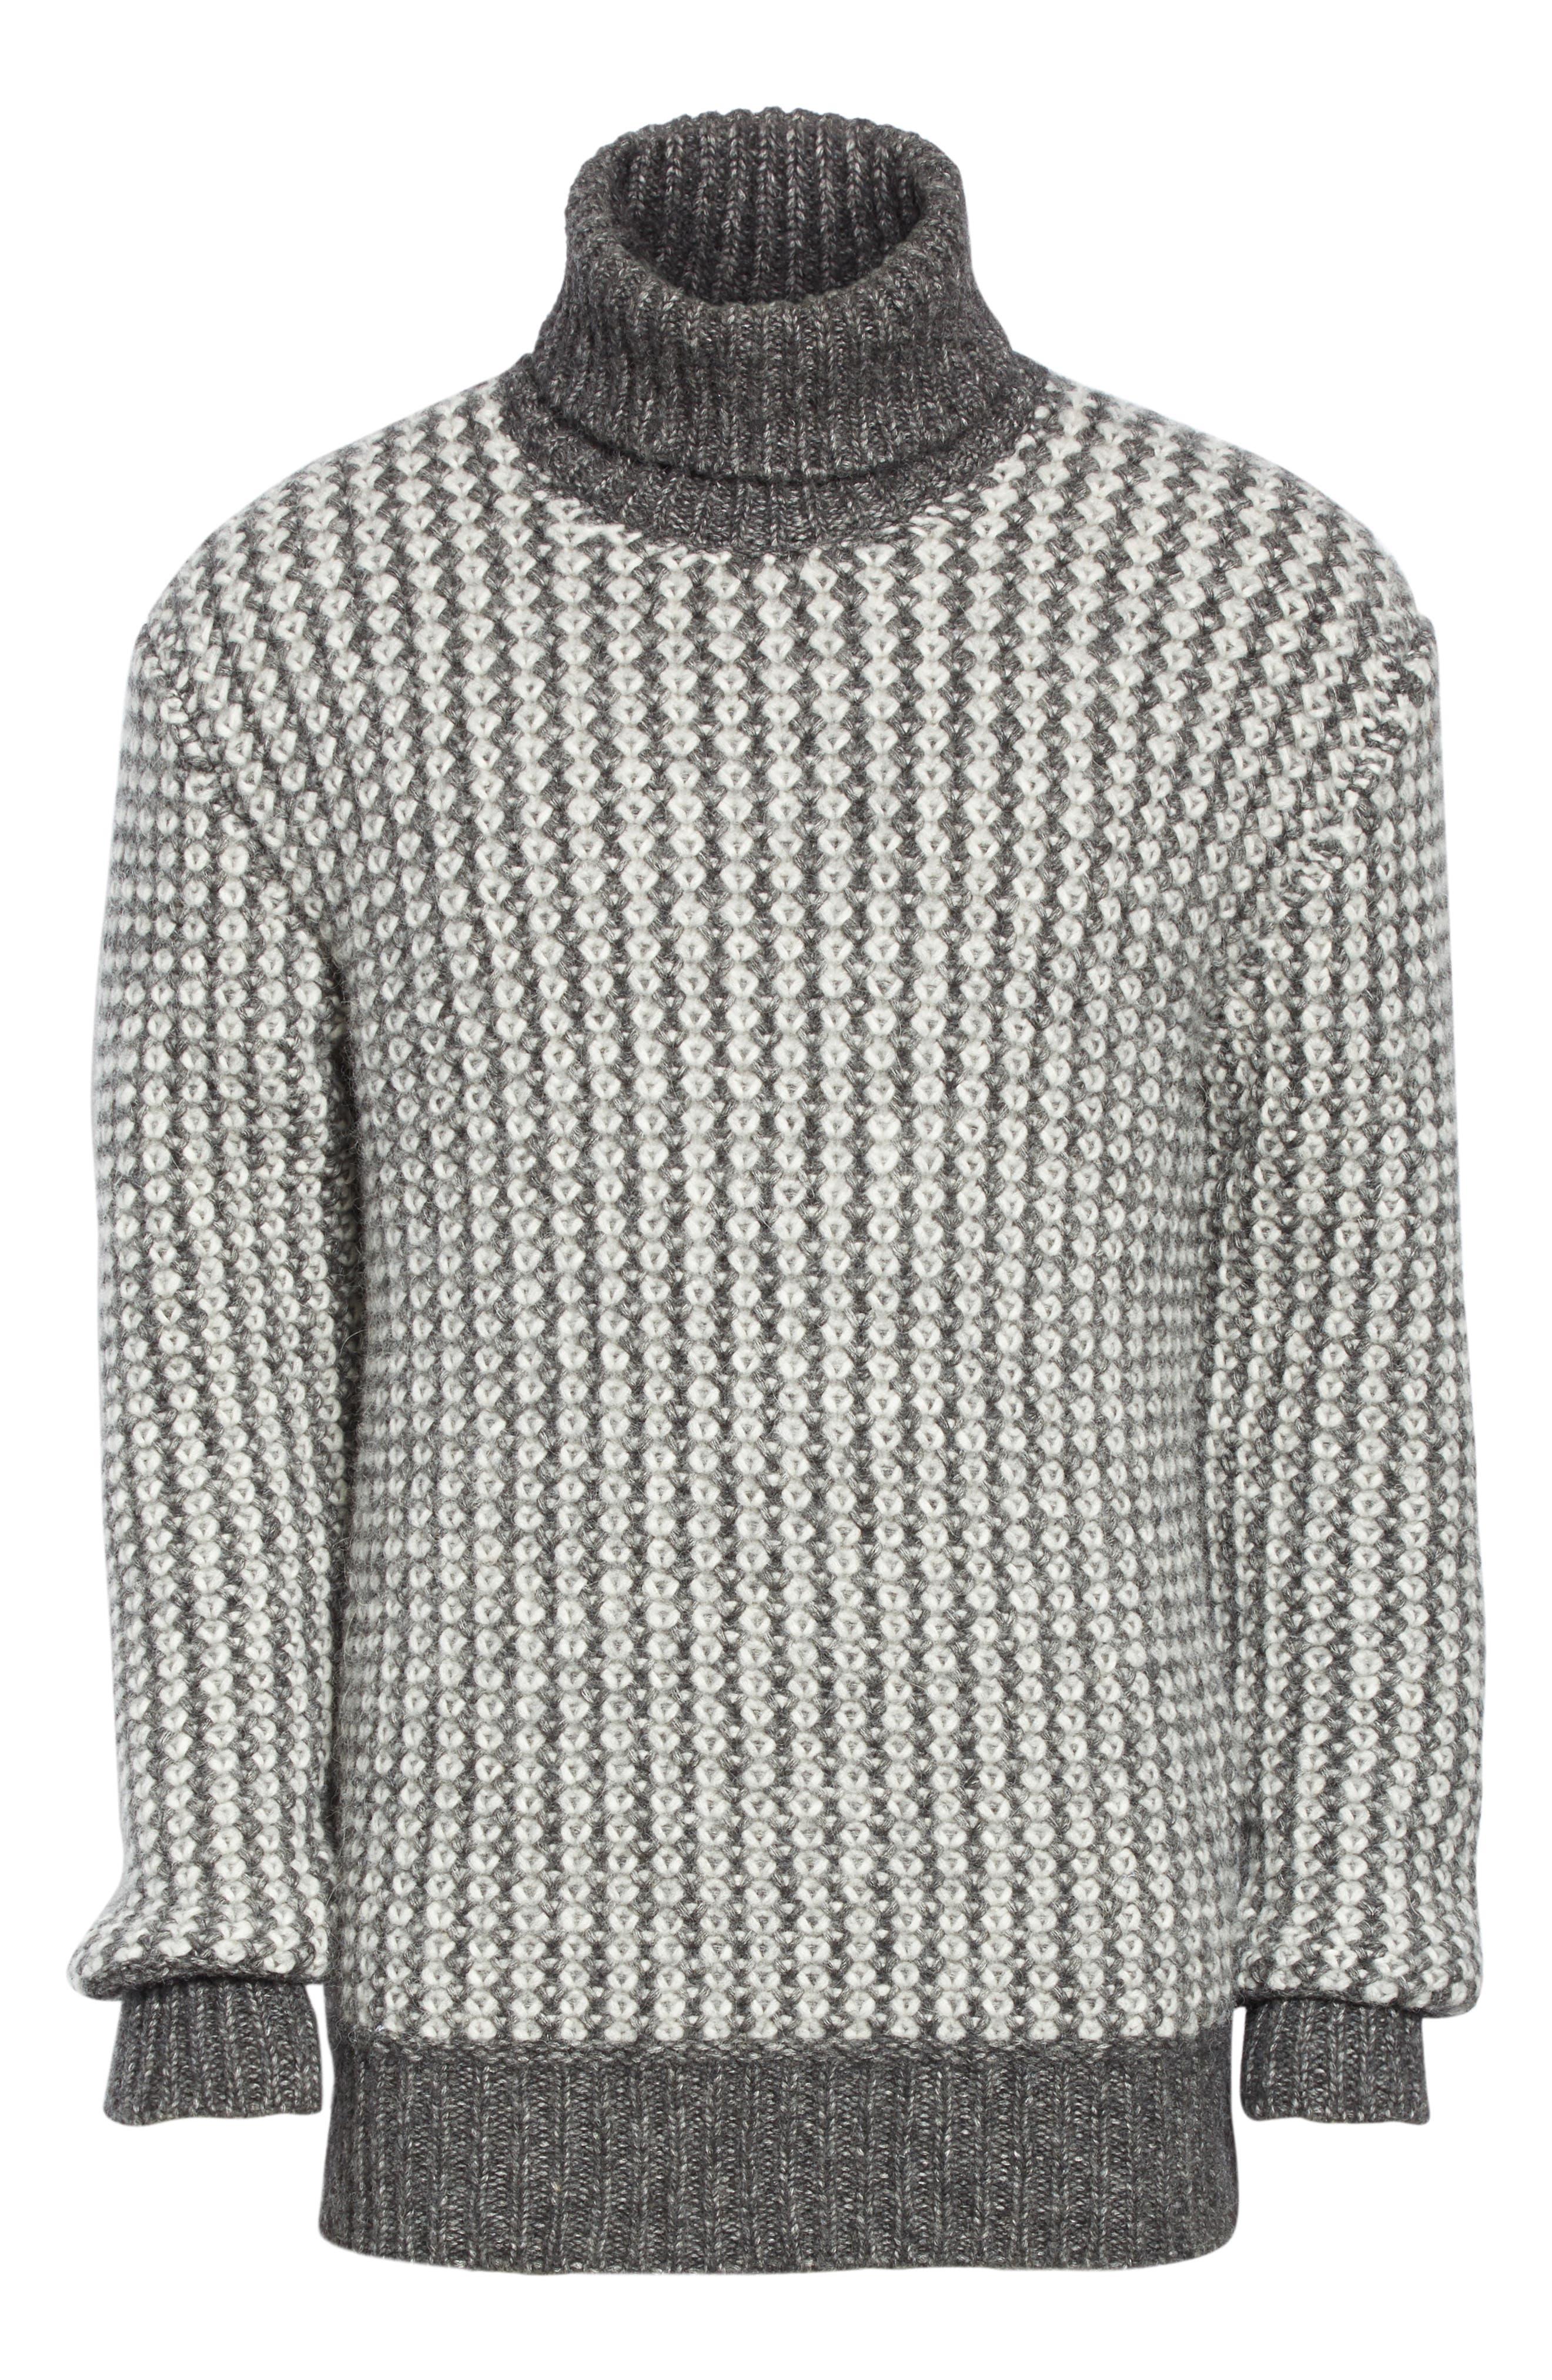 Cotton Blend Turtleneck Sweater,                             Alternate thumbnail 6, color,                             GREY